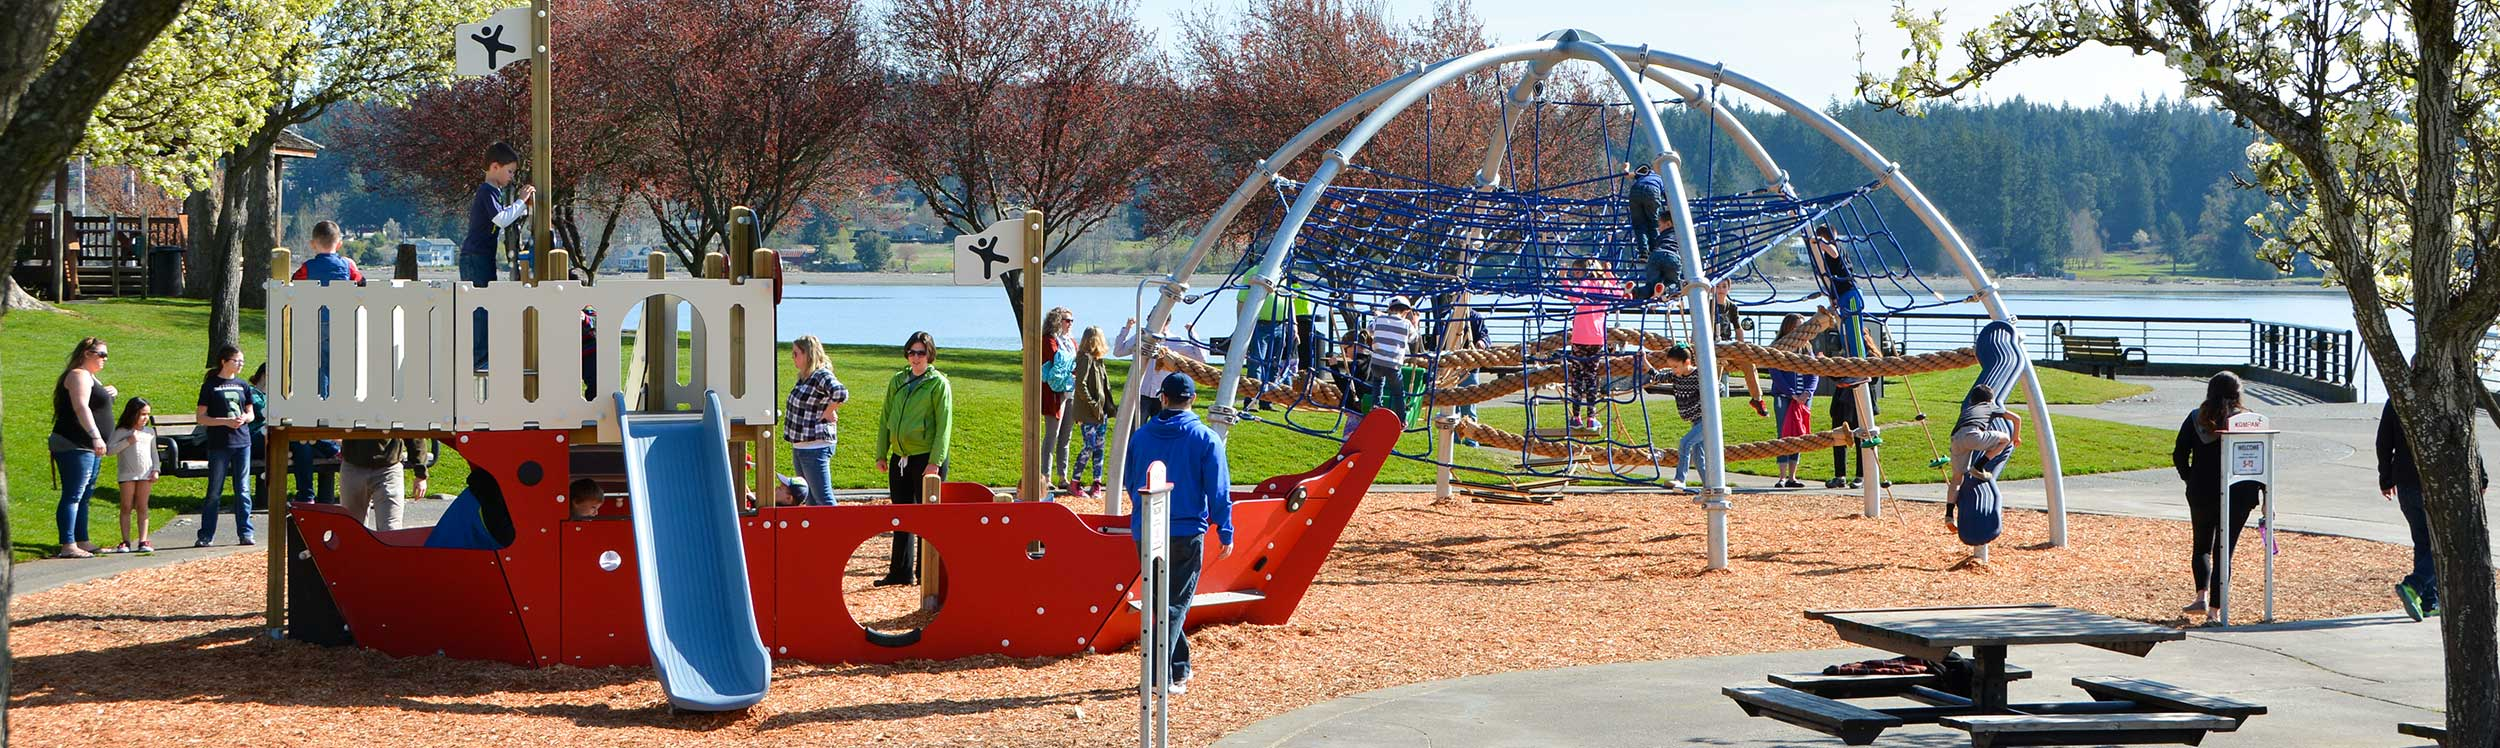 Family park and playground equipment